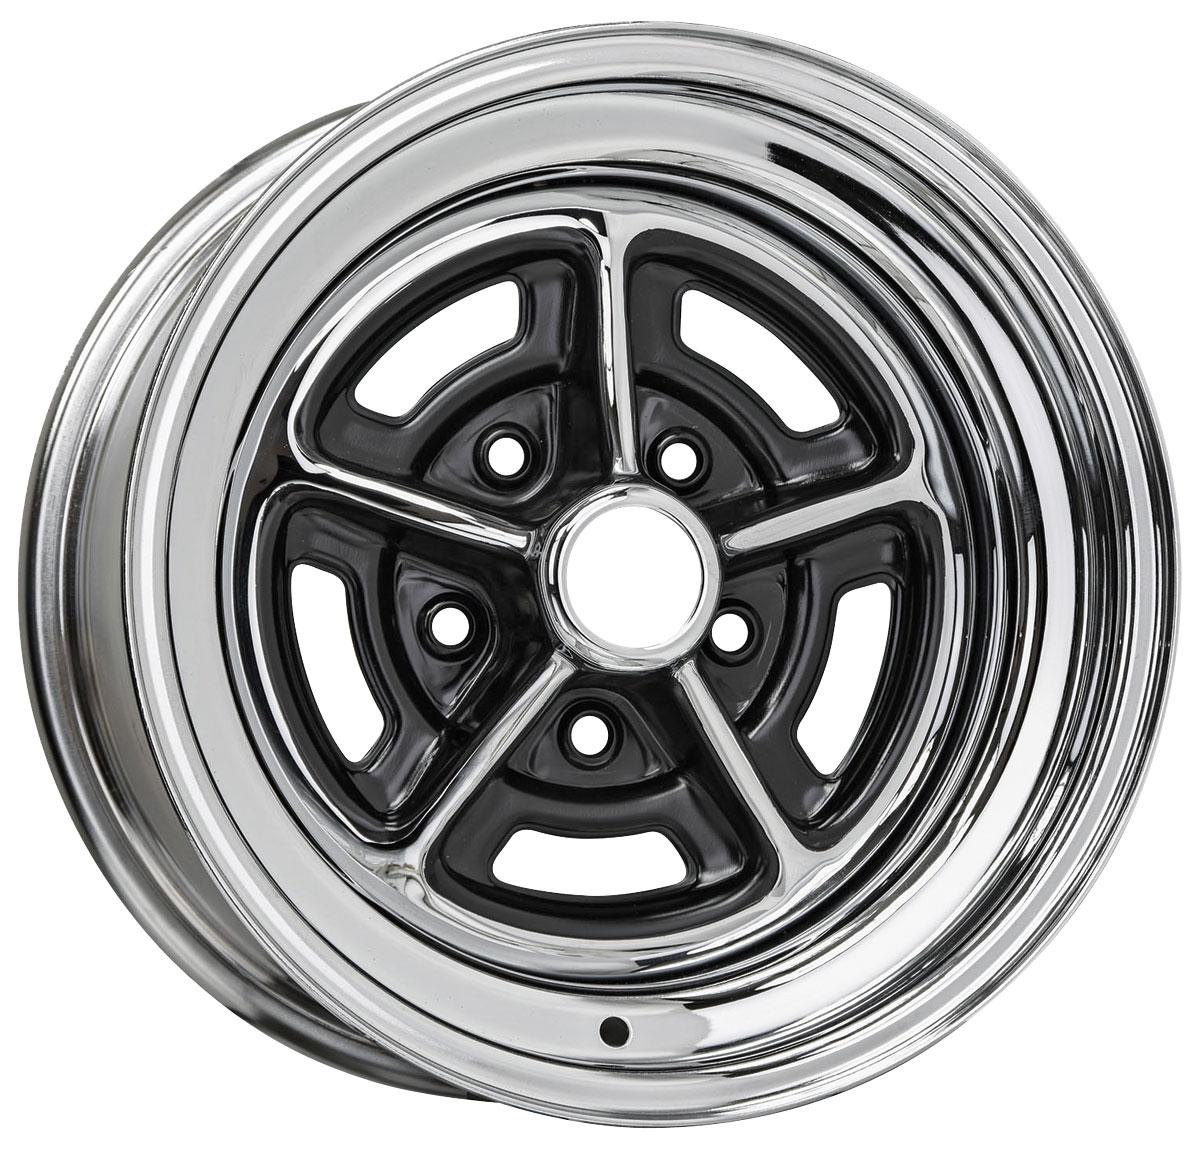 "Wheel, Buick Rally, 14X6, 3-1/2"" Back Spacing"